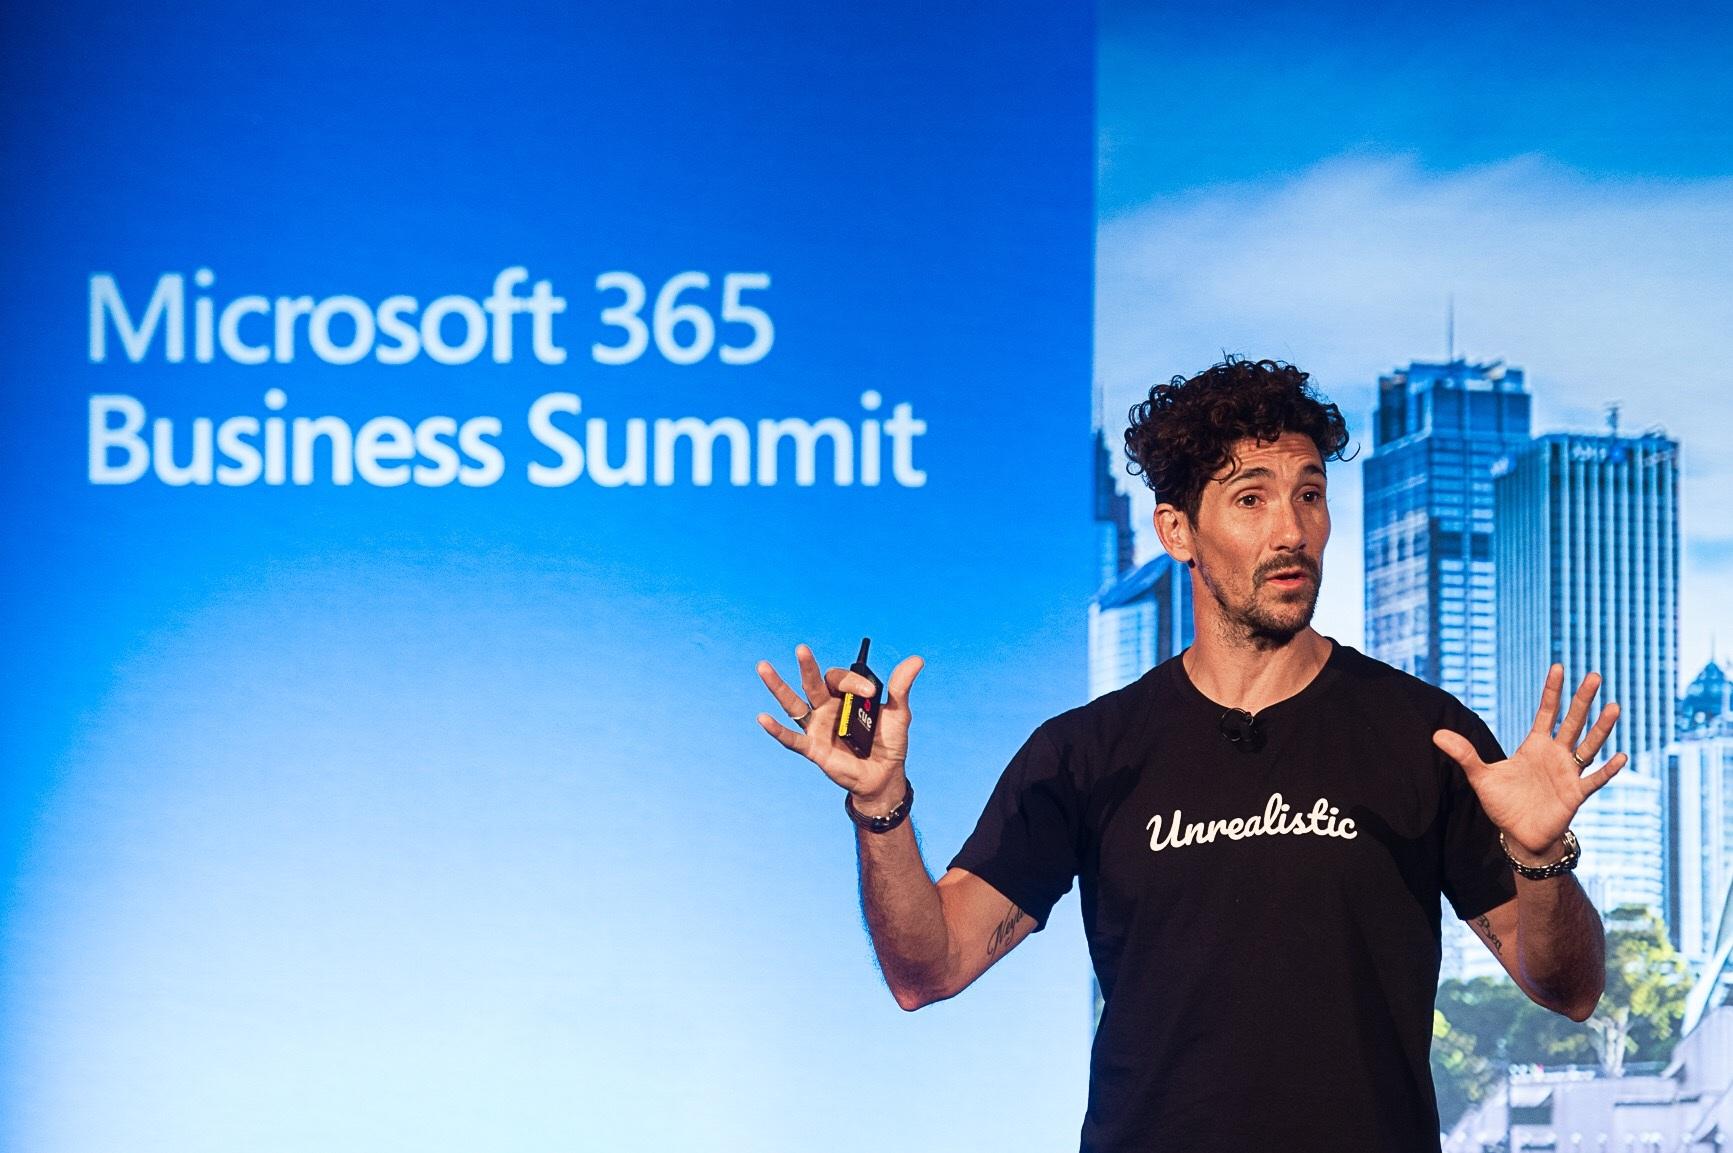 Microsoft Business Summit  - Sydney Australia